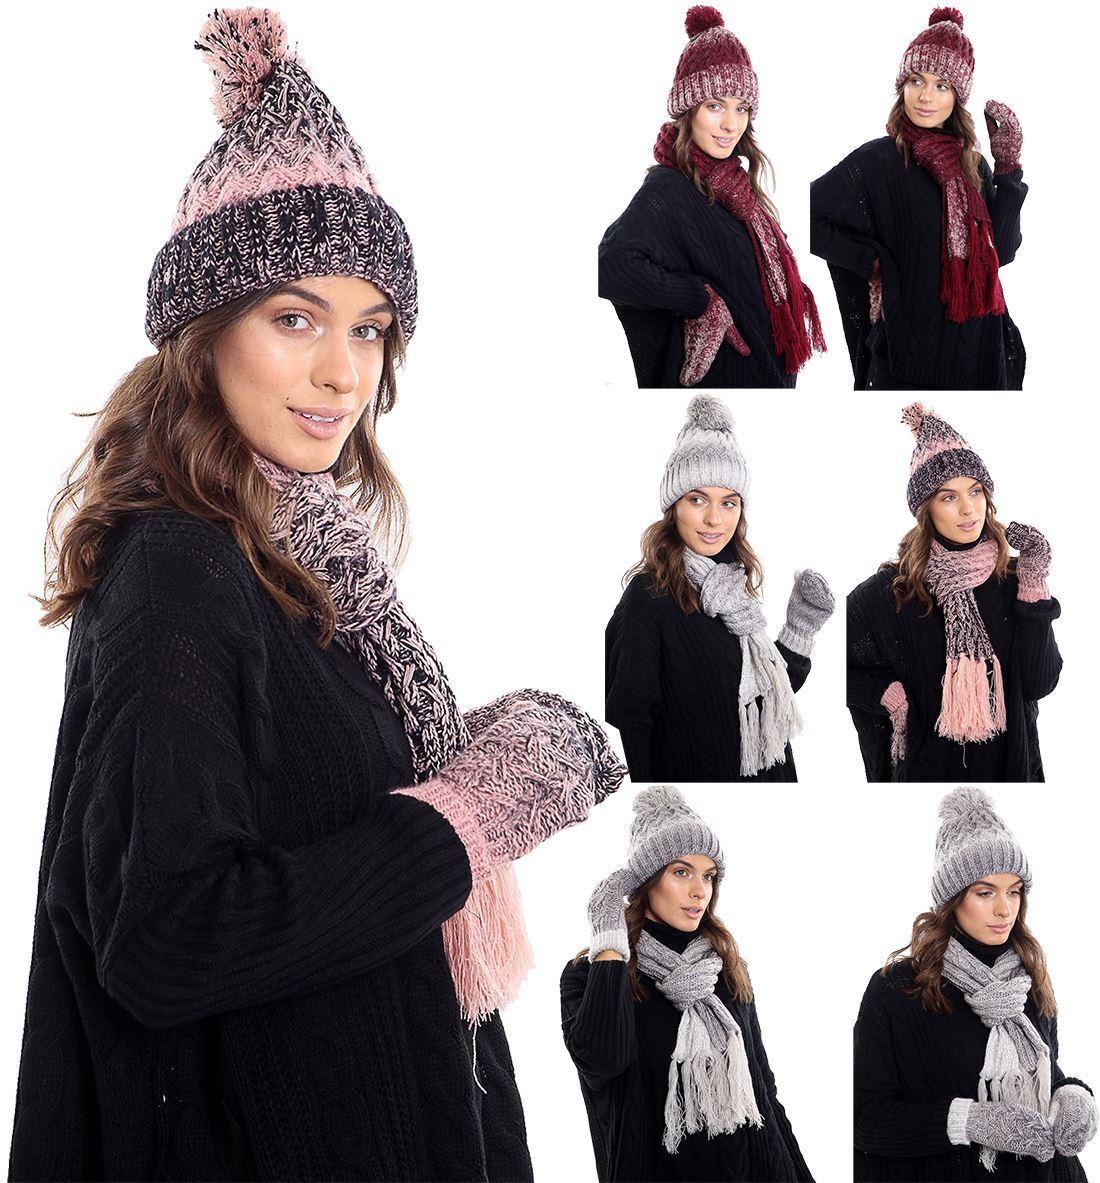 Ladies Fleece Lined Warm Scarf Hat And Mittens Set Women Winter Wear Accessories